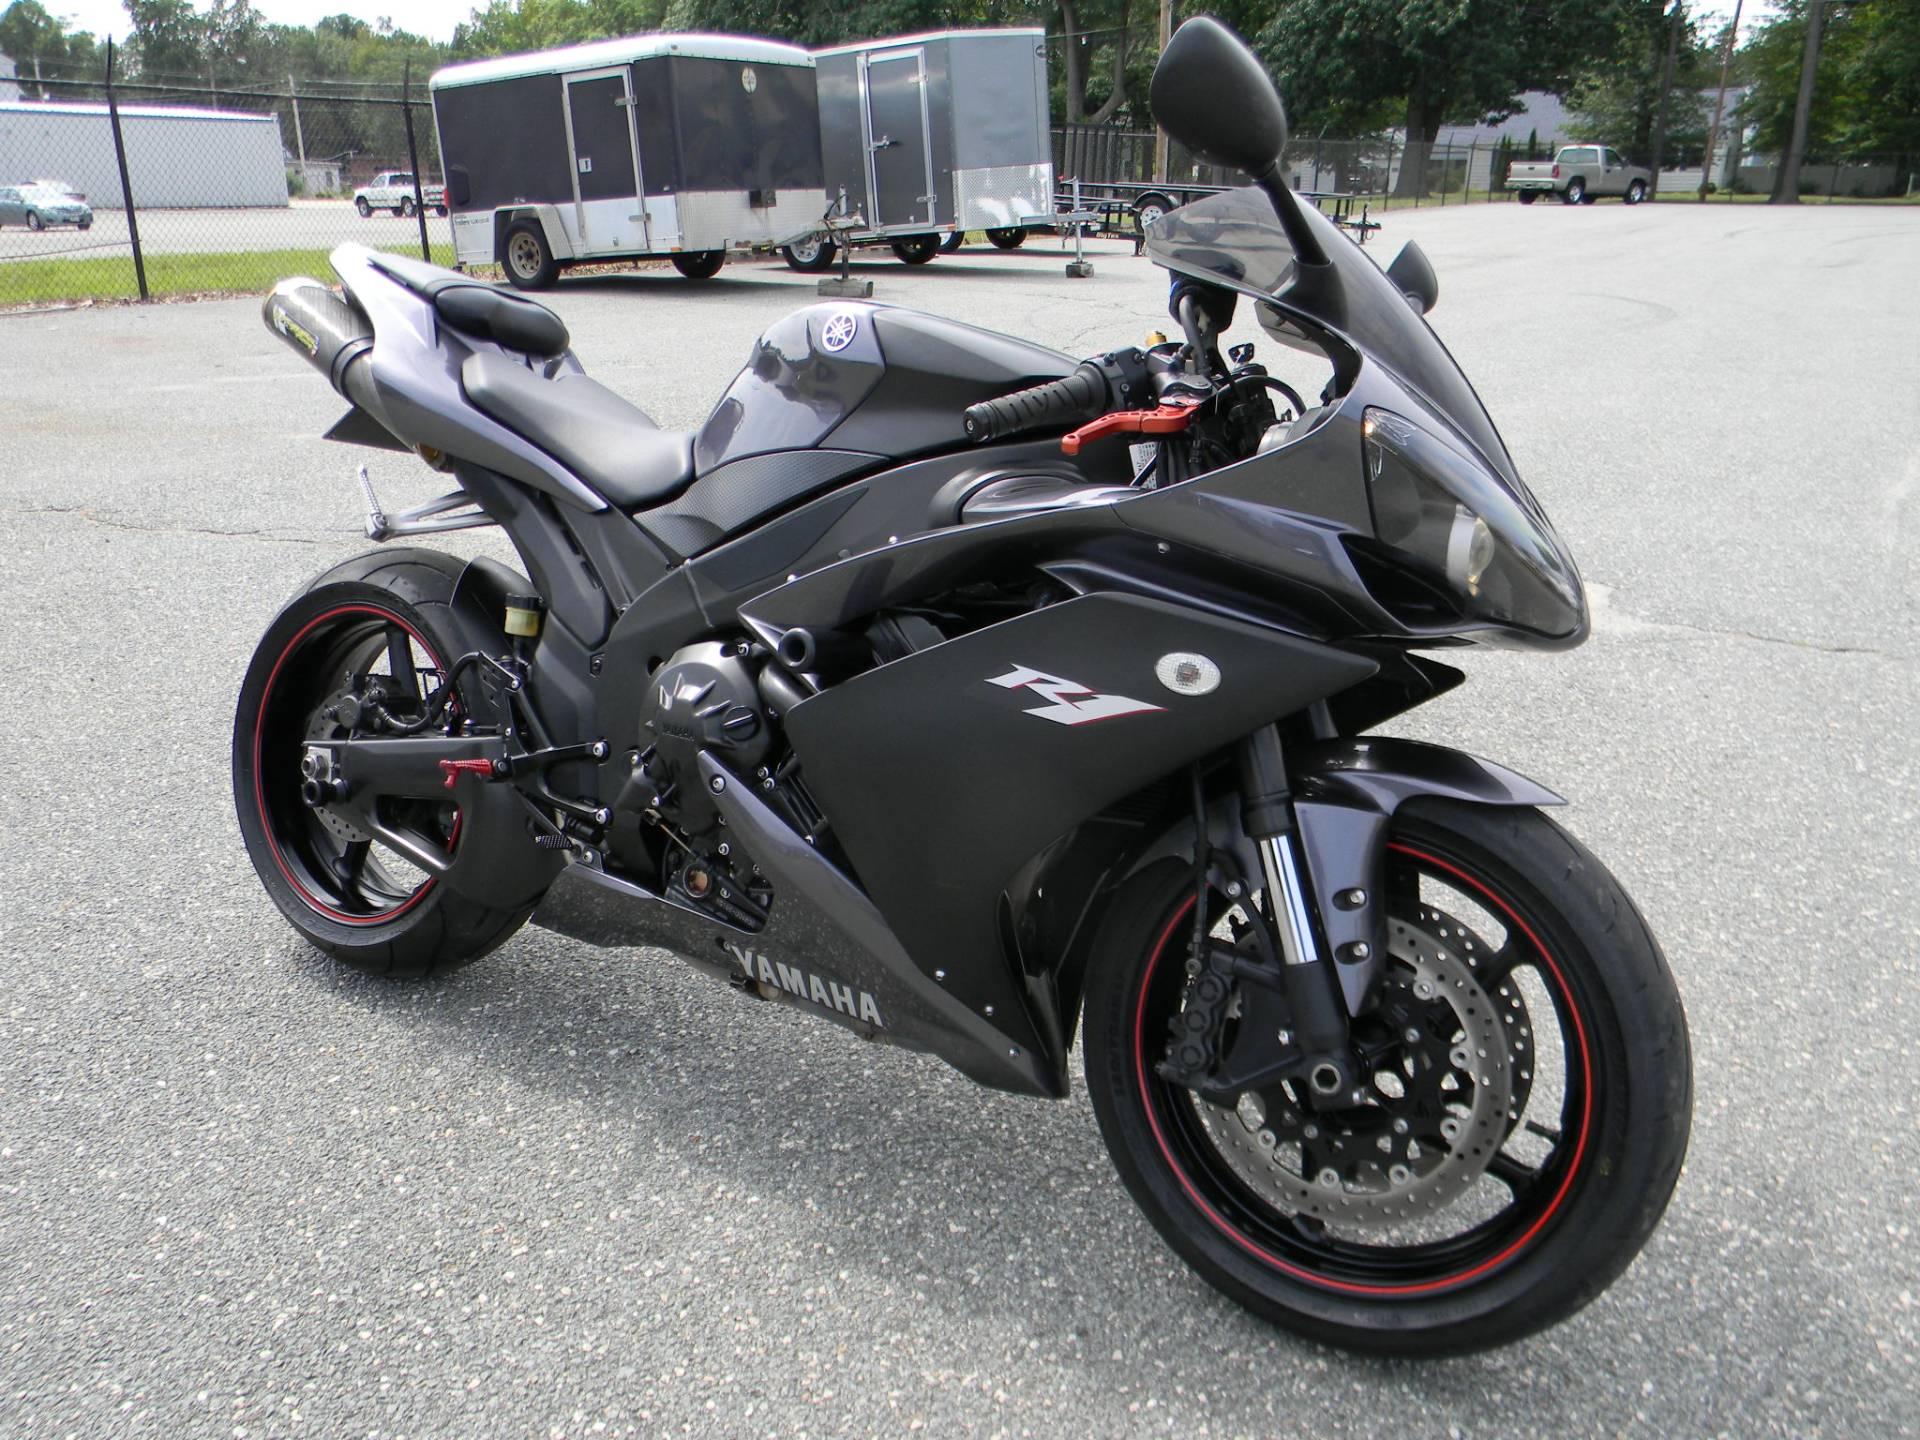 2007 Yamaha YZF-R1 2